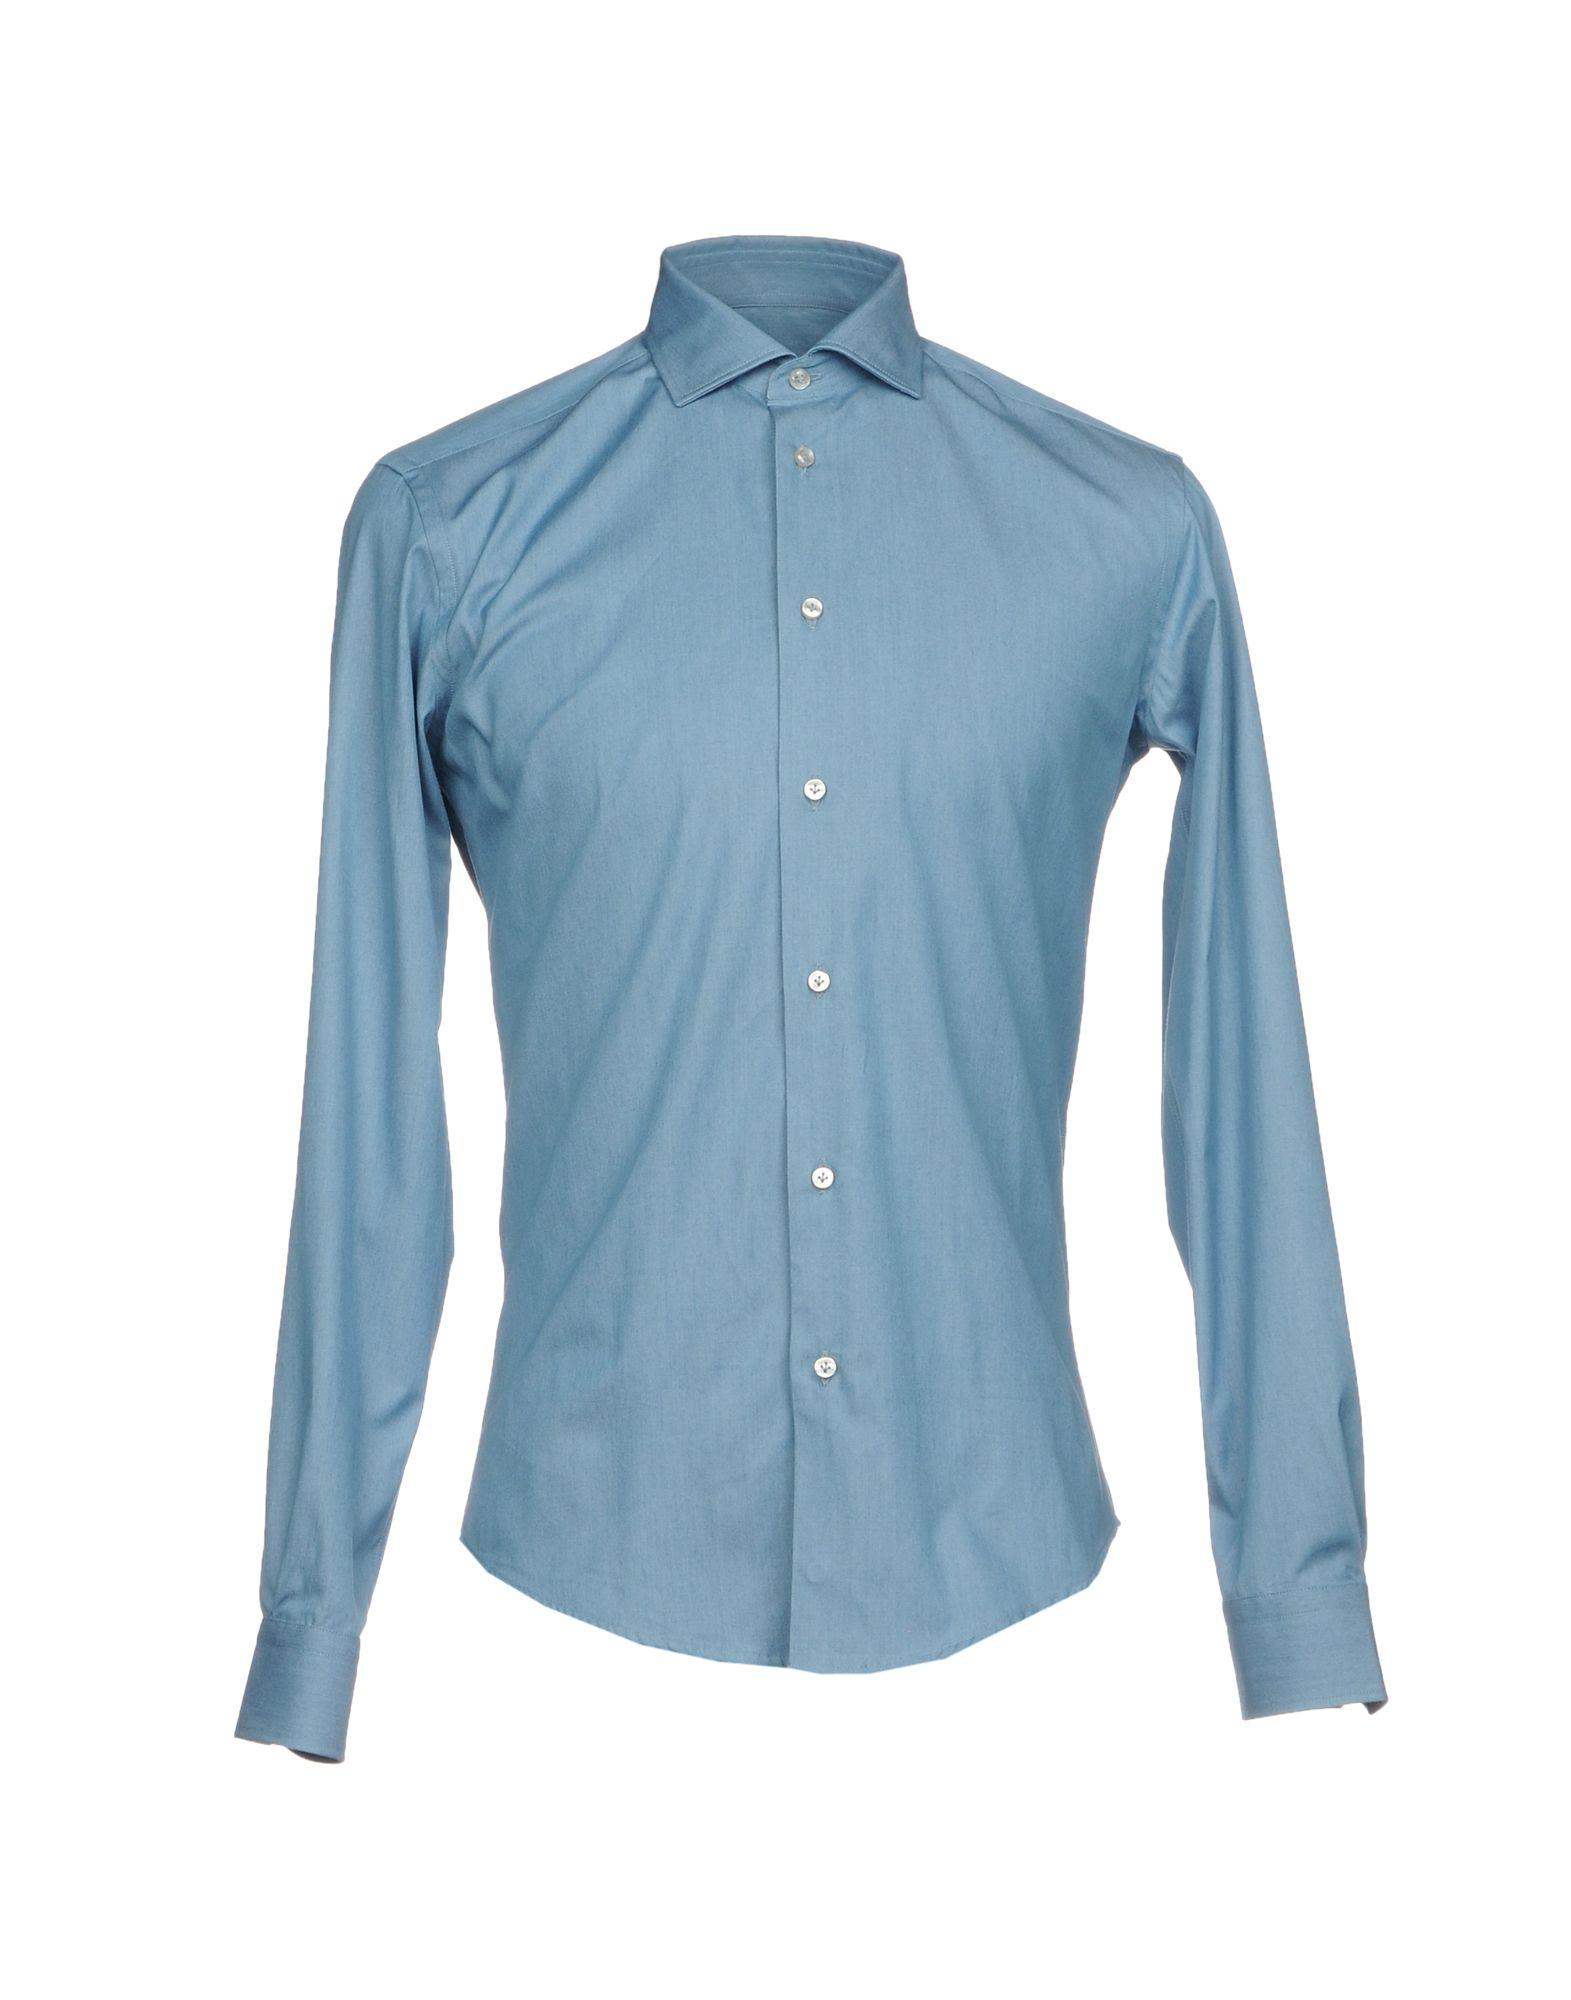 Camicia Tinta Unita Unita Unita Brian Dales Uomo - 38684912WE 26fb0d